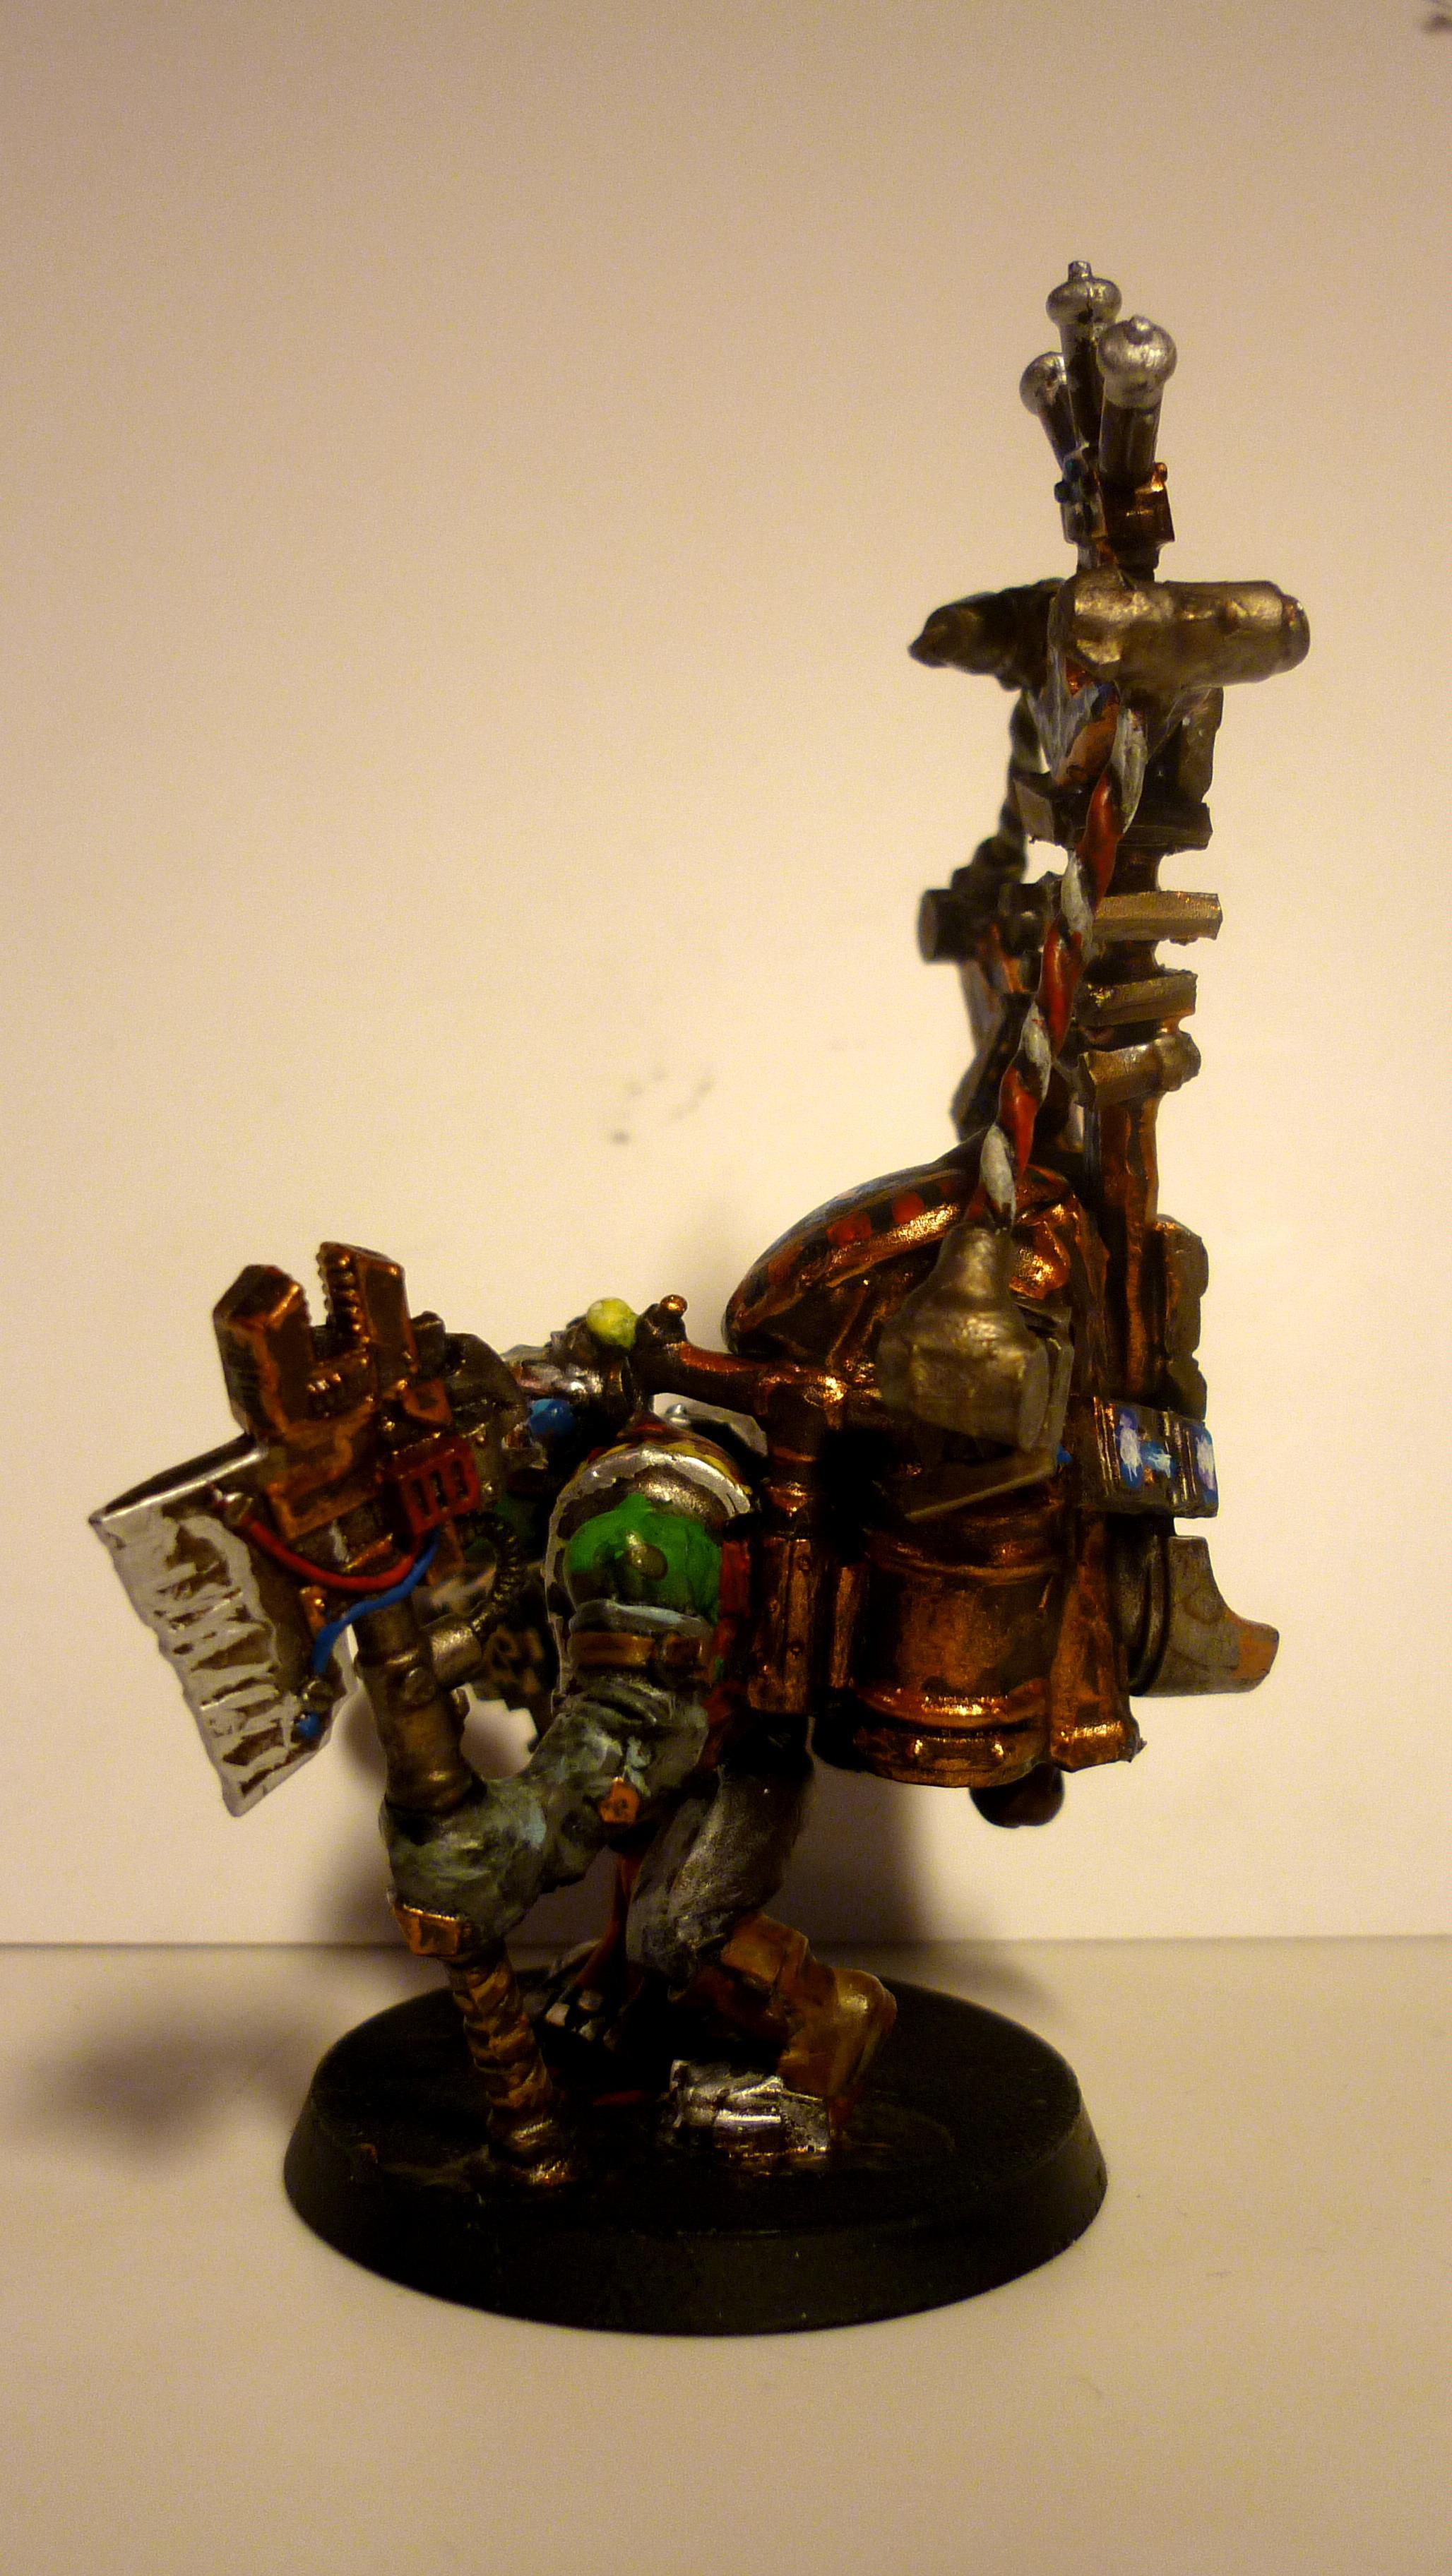 Big Mek, Conversion, Mekboy, Orcs, Orks